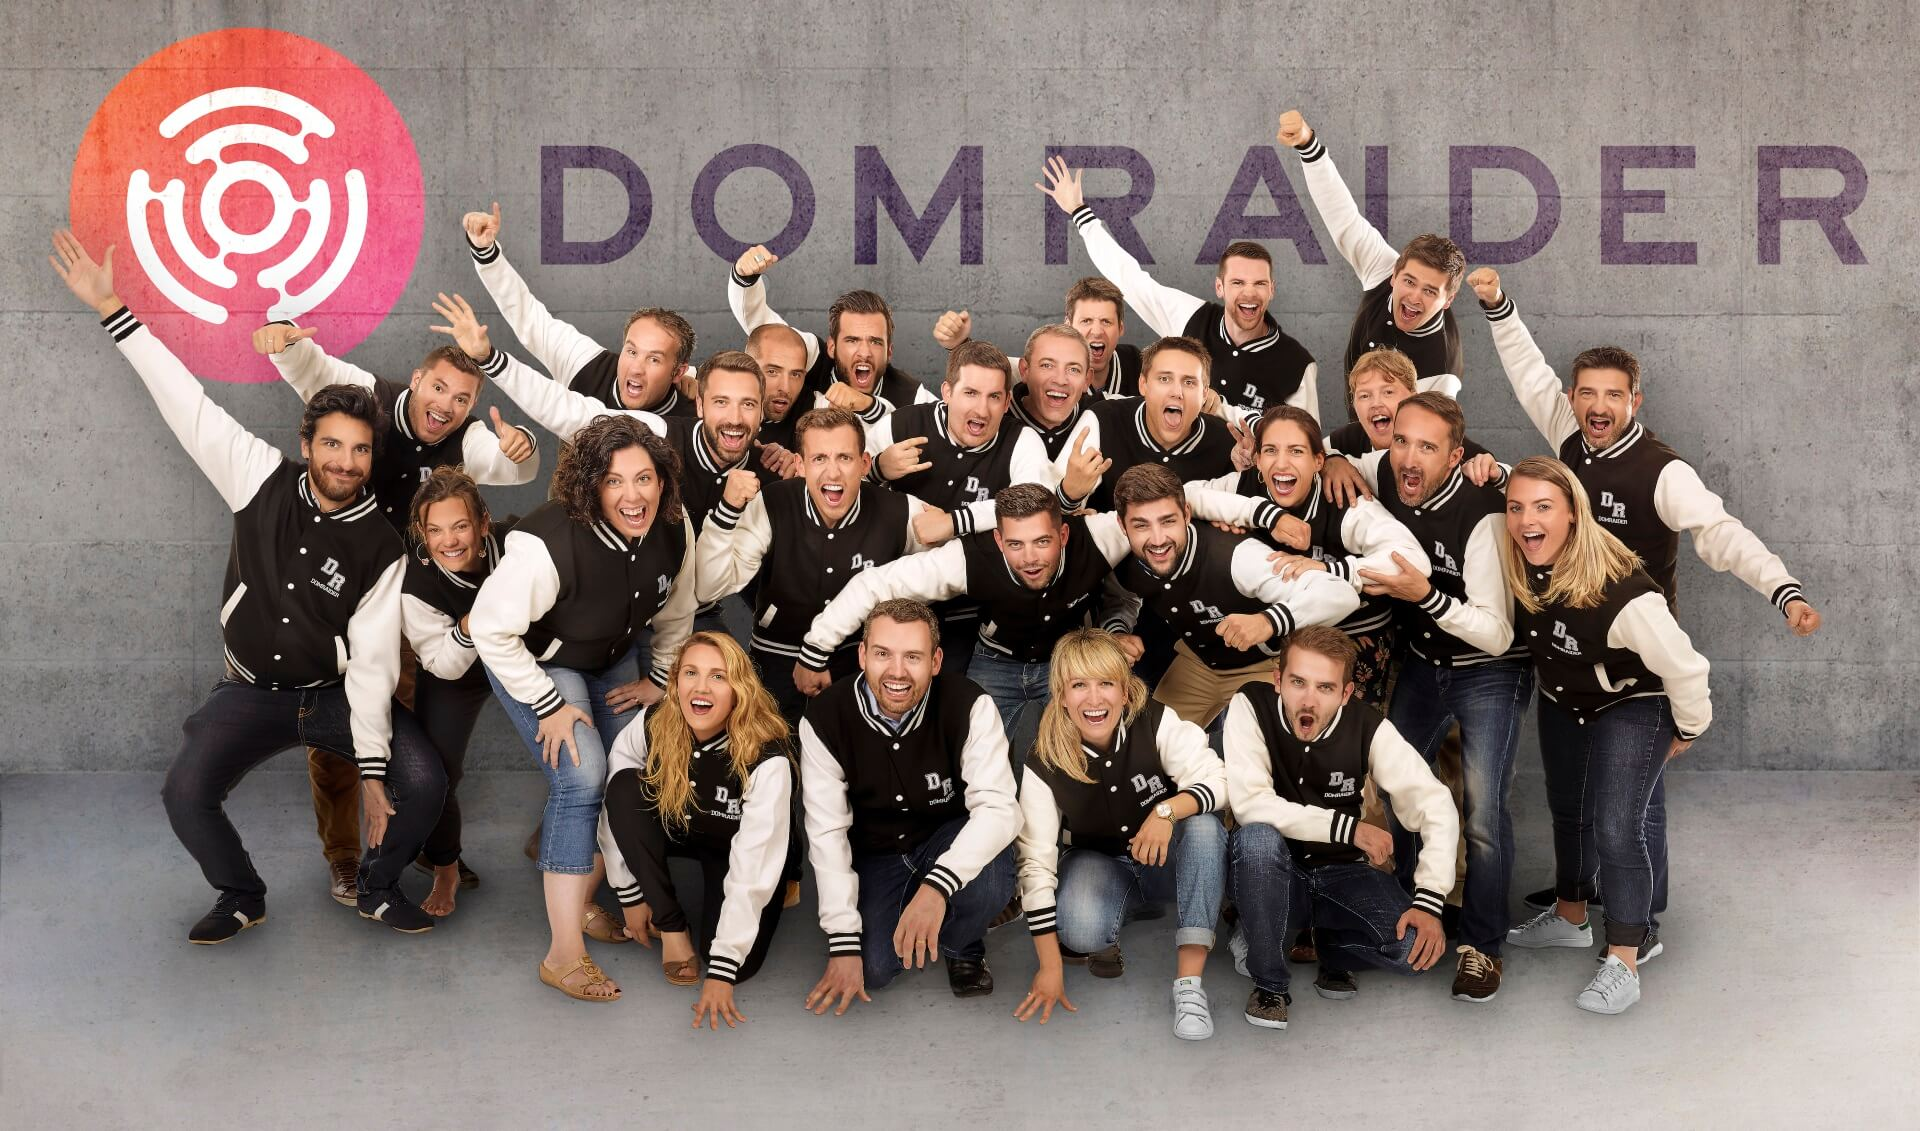 domraider equipe fond gris logo